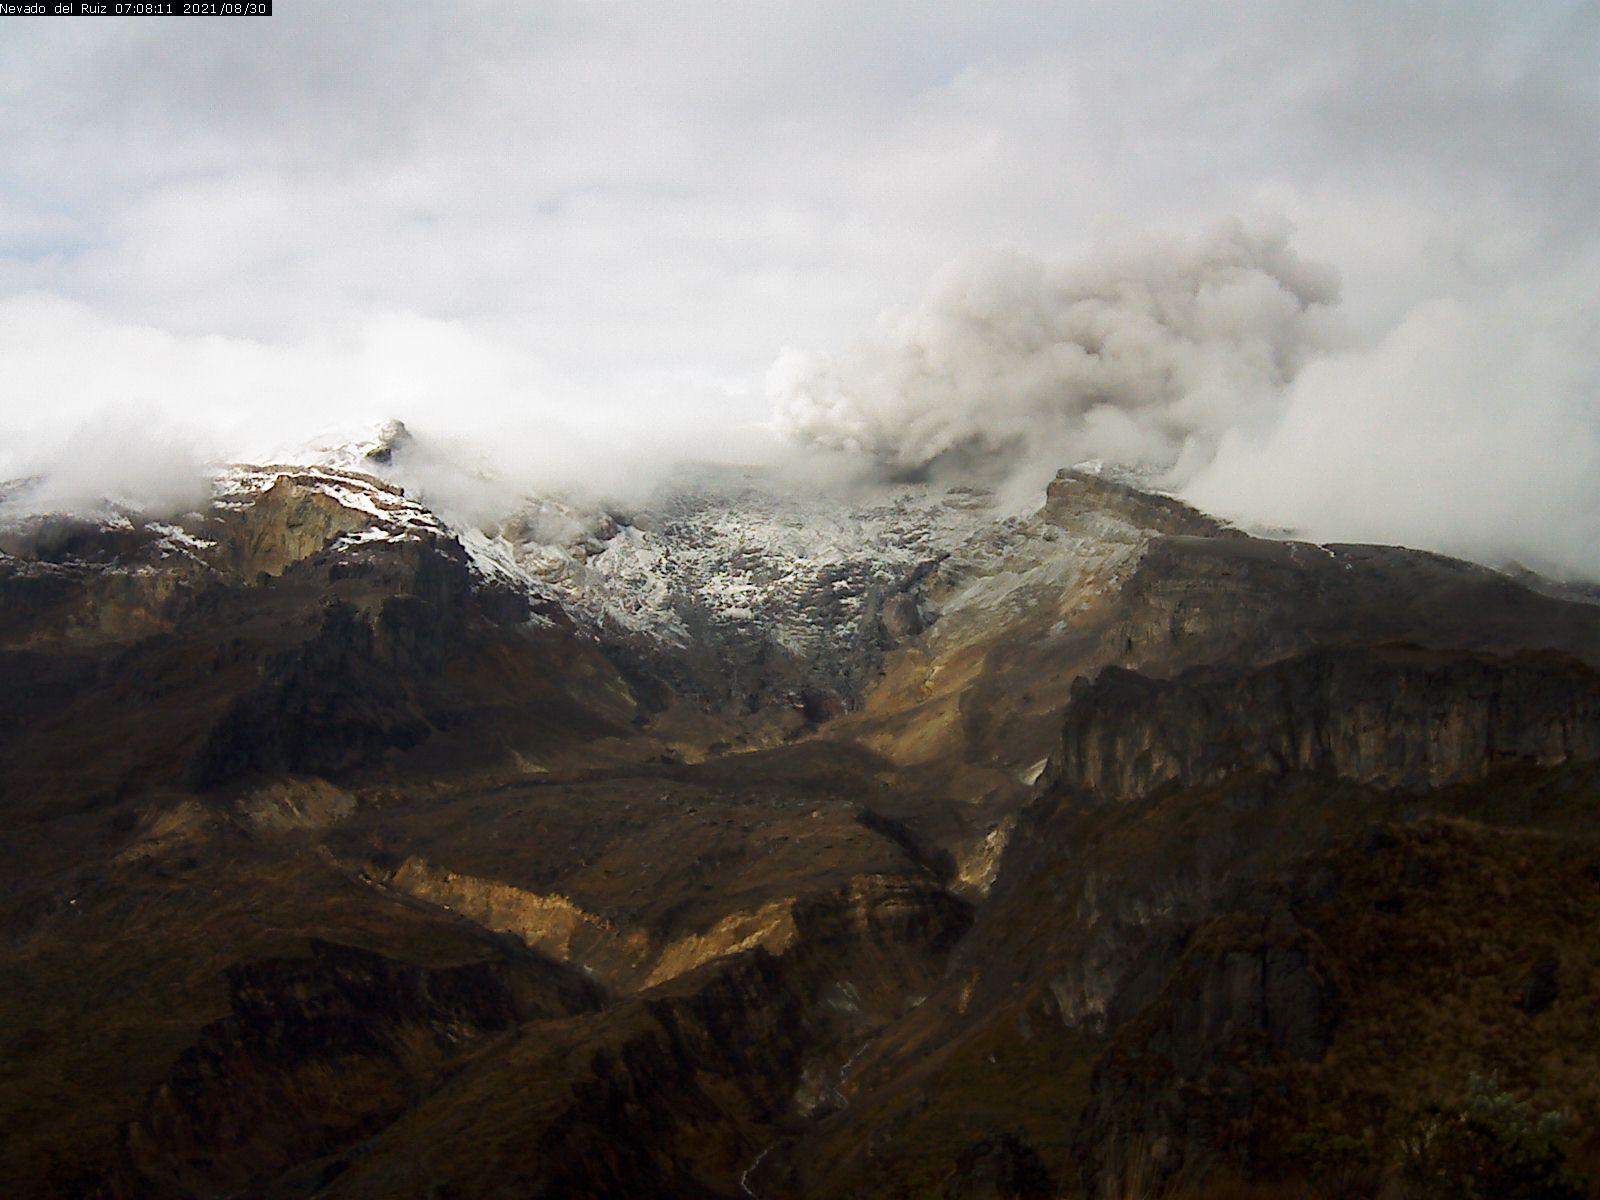 Sporadic amount of ash occurs from Nevado del Ruiz volcano (image: INGEOMINAS)